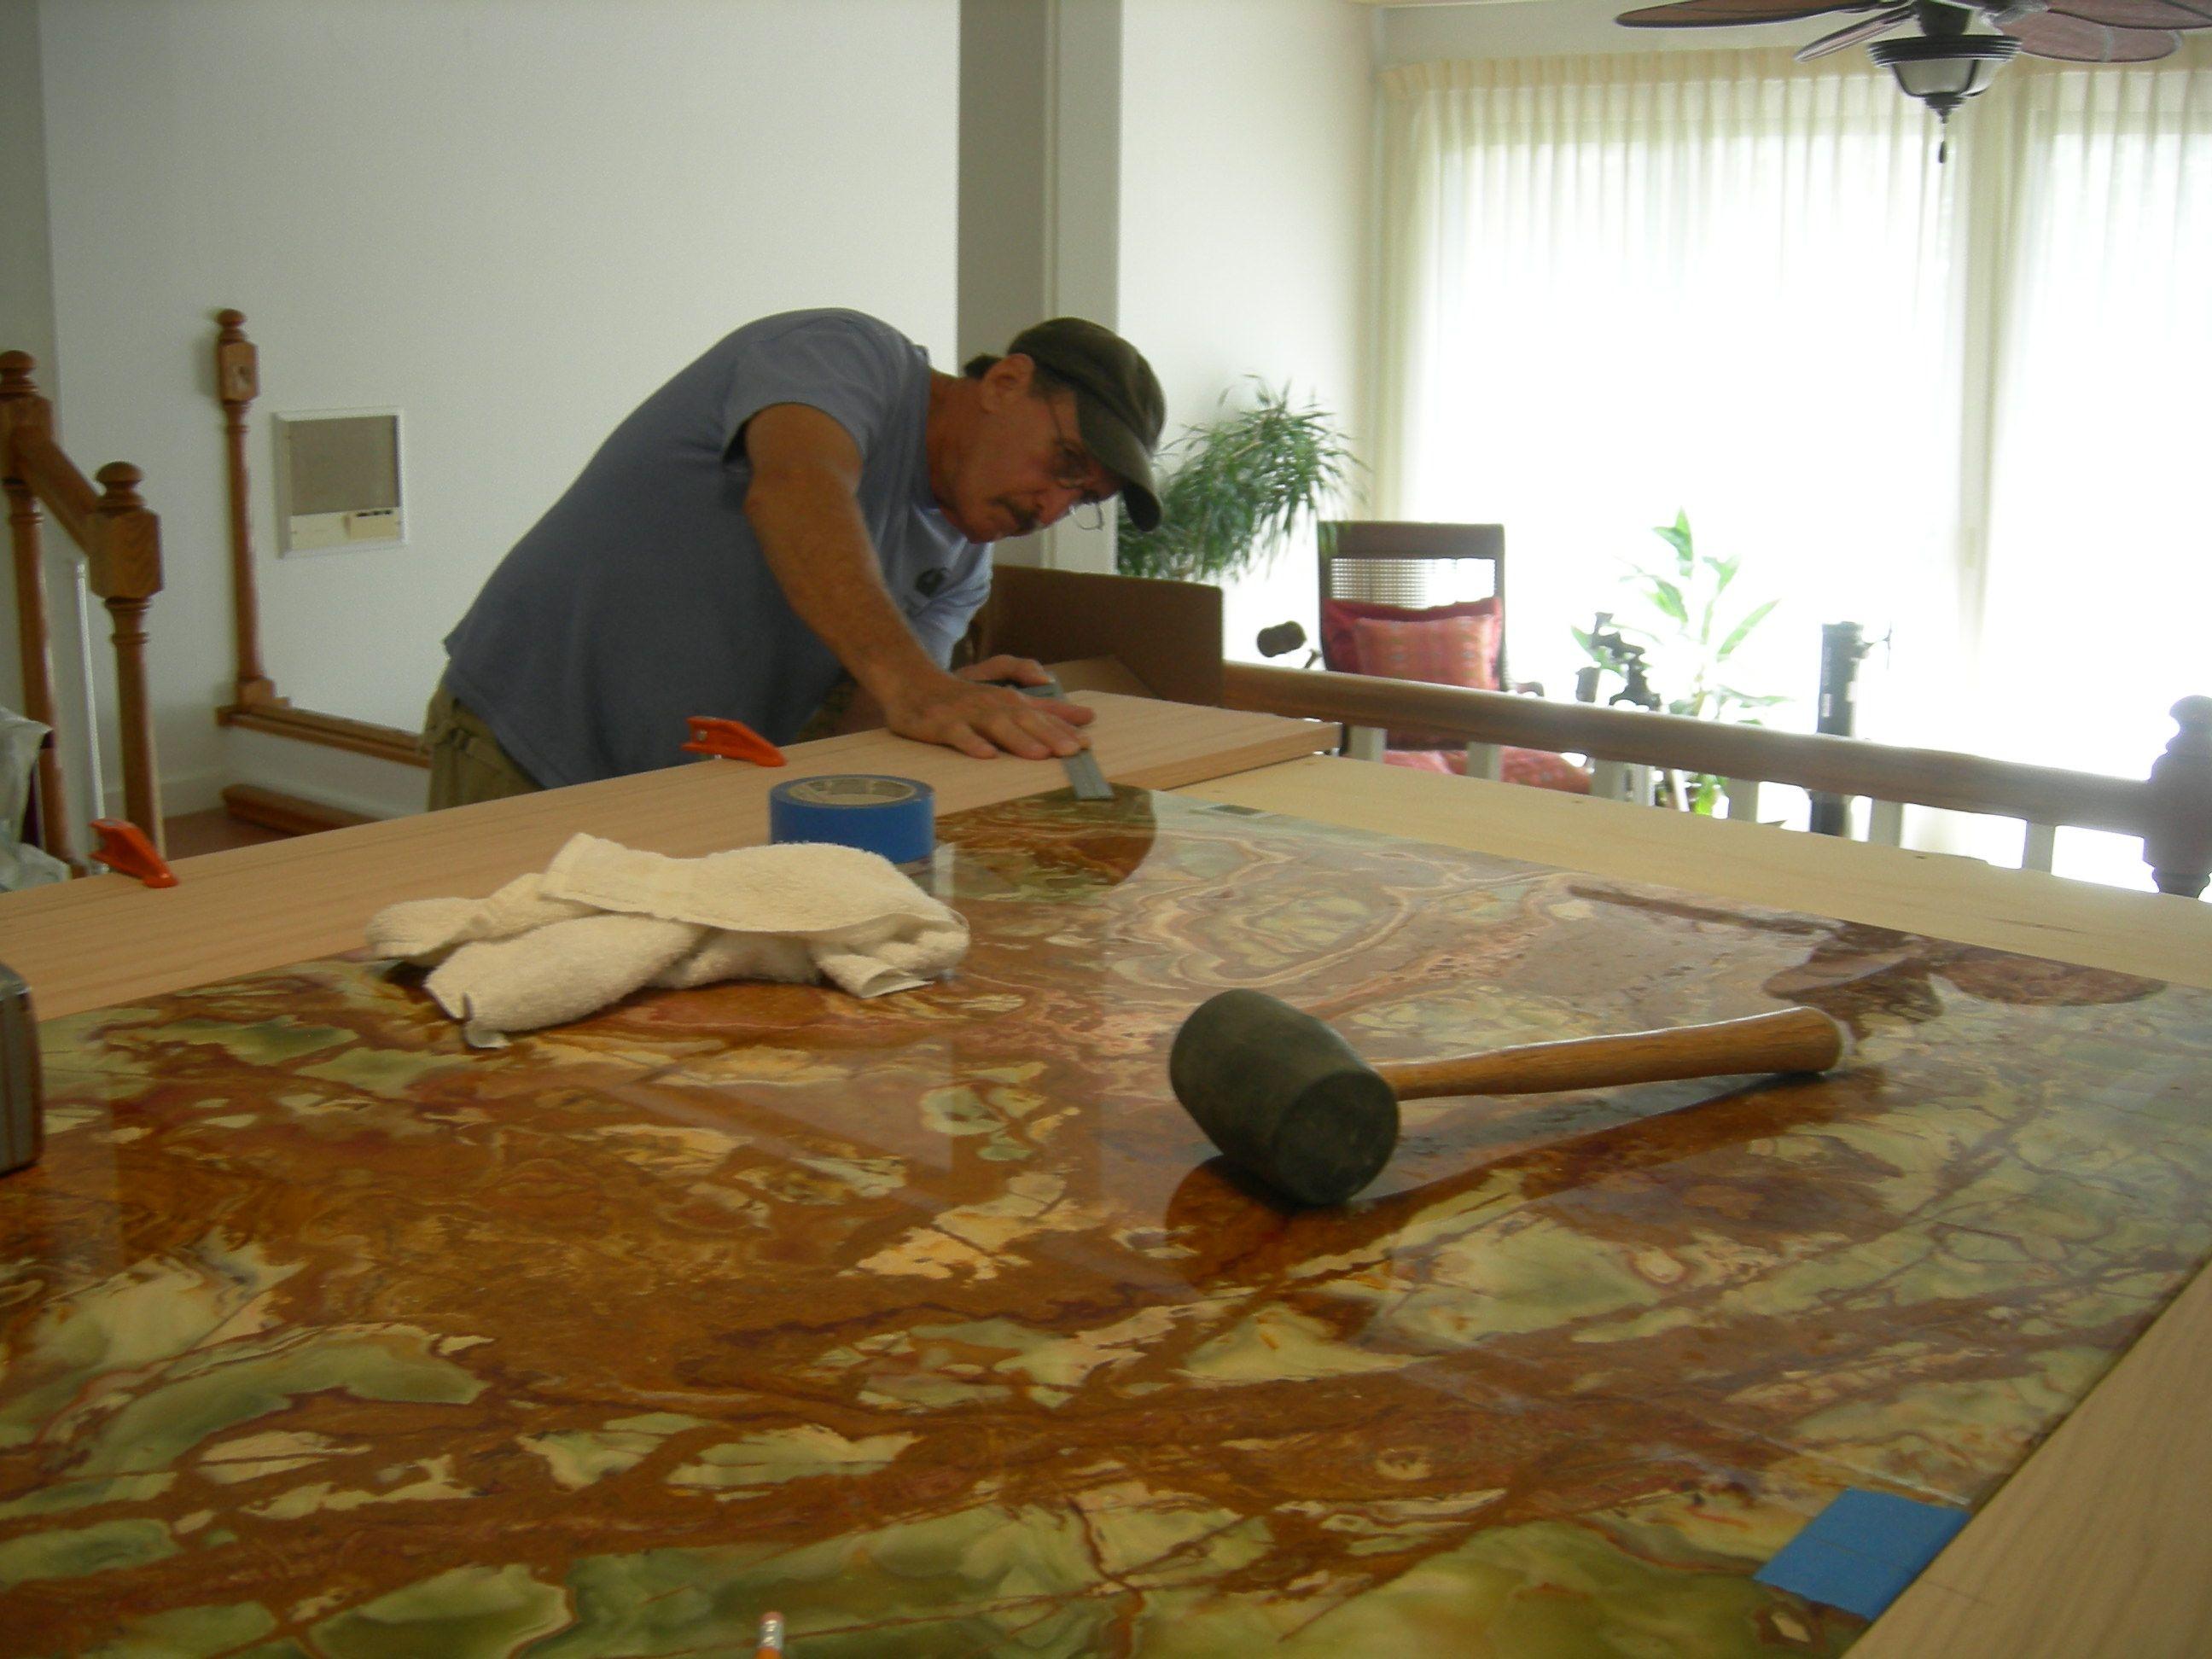 The Furniture Doctor 13725 Beach Blvd Ste 17 Jacksonville Fl 32224